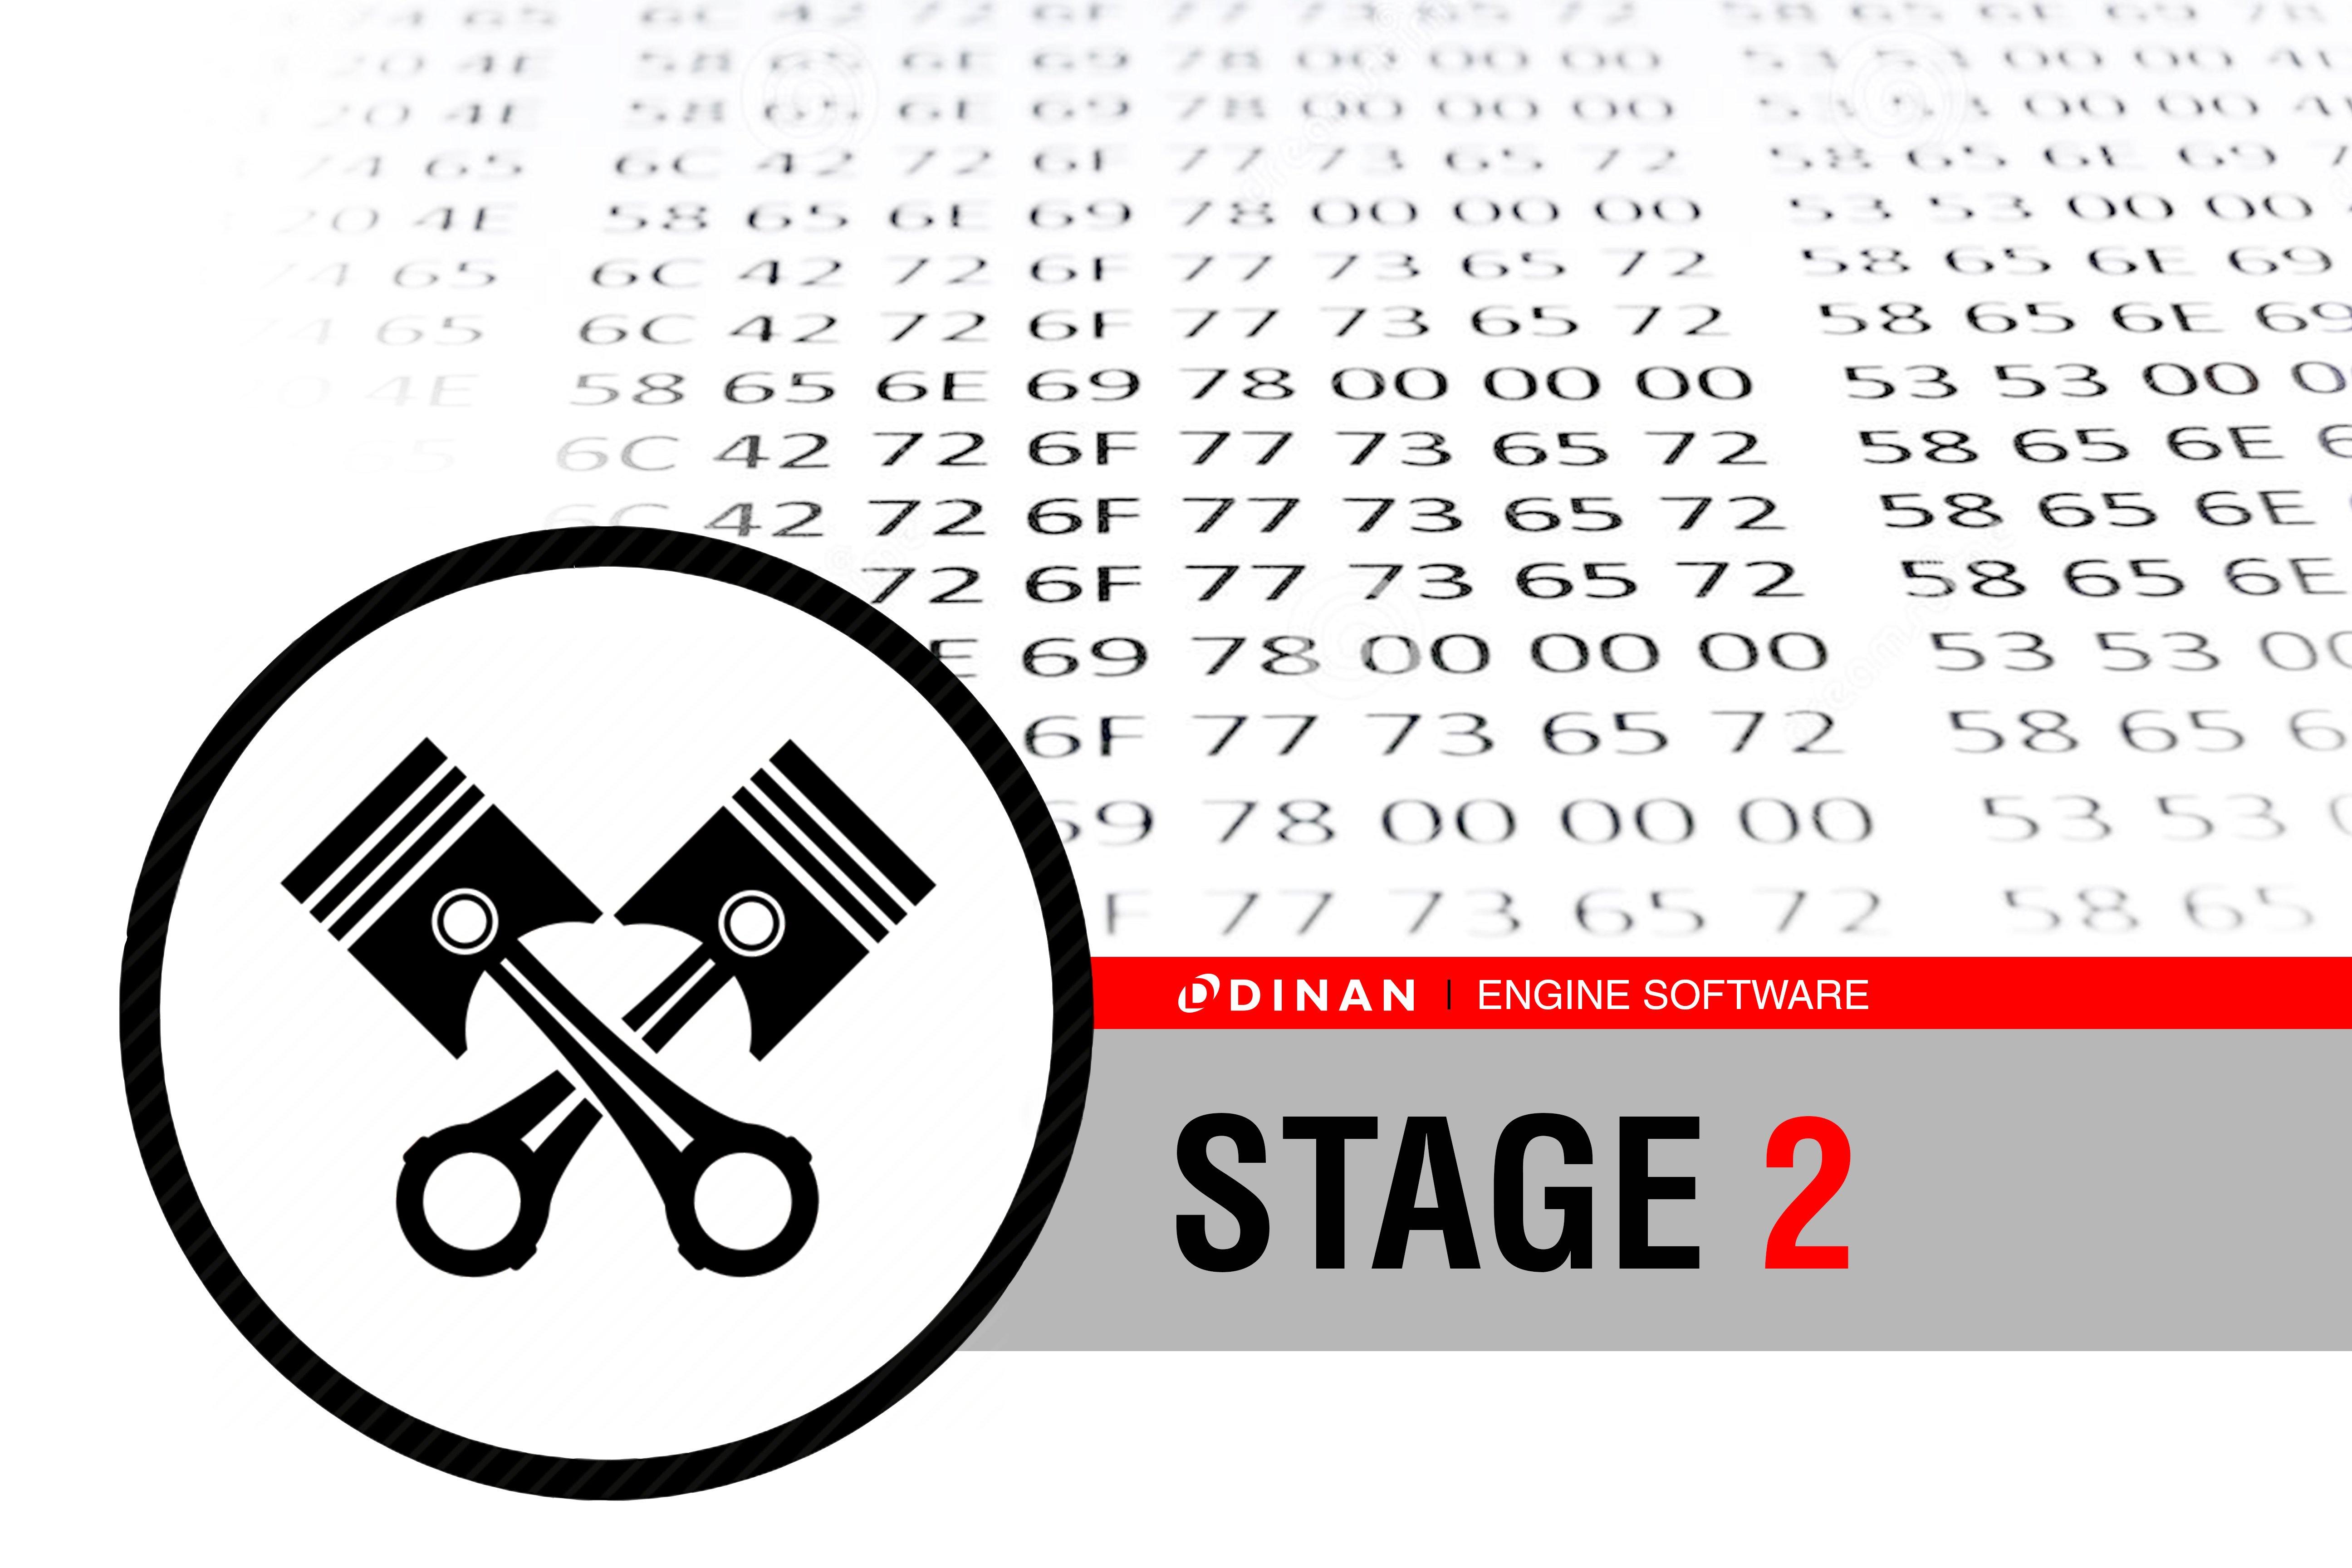 Dinan D900 30t Dinan Stage 2 Performance Engine Software 2007 2016 Bmw 135i 335i 335is 535i Z4